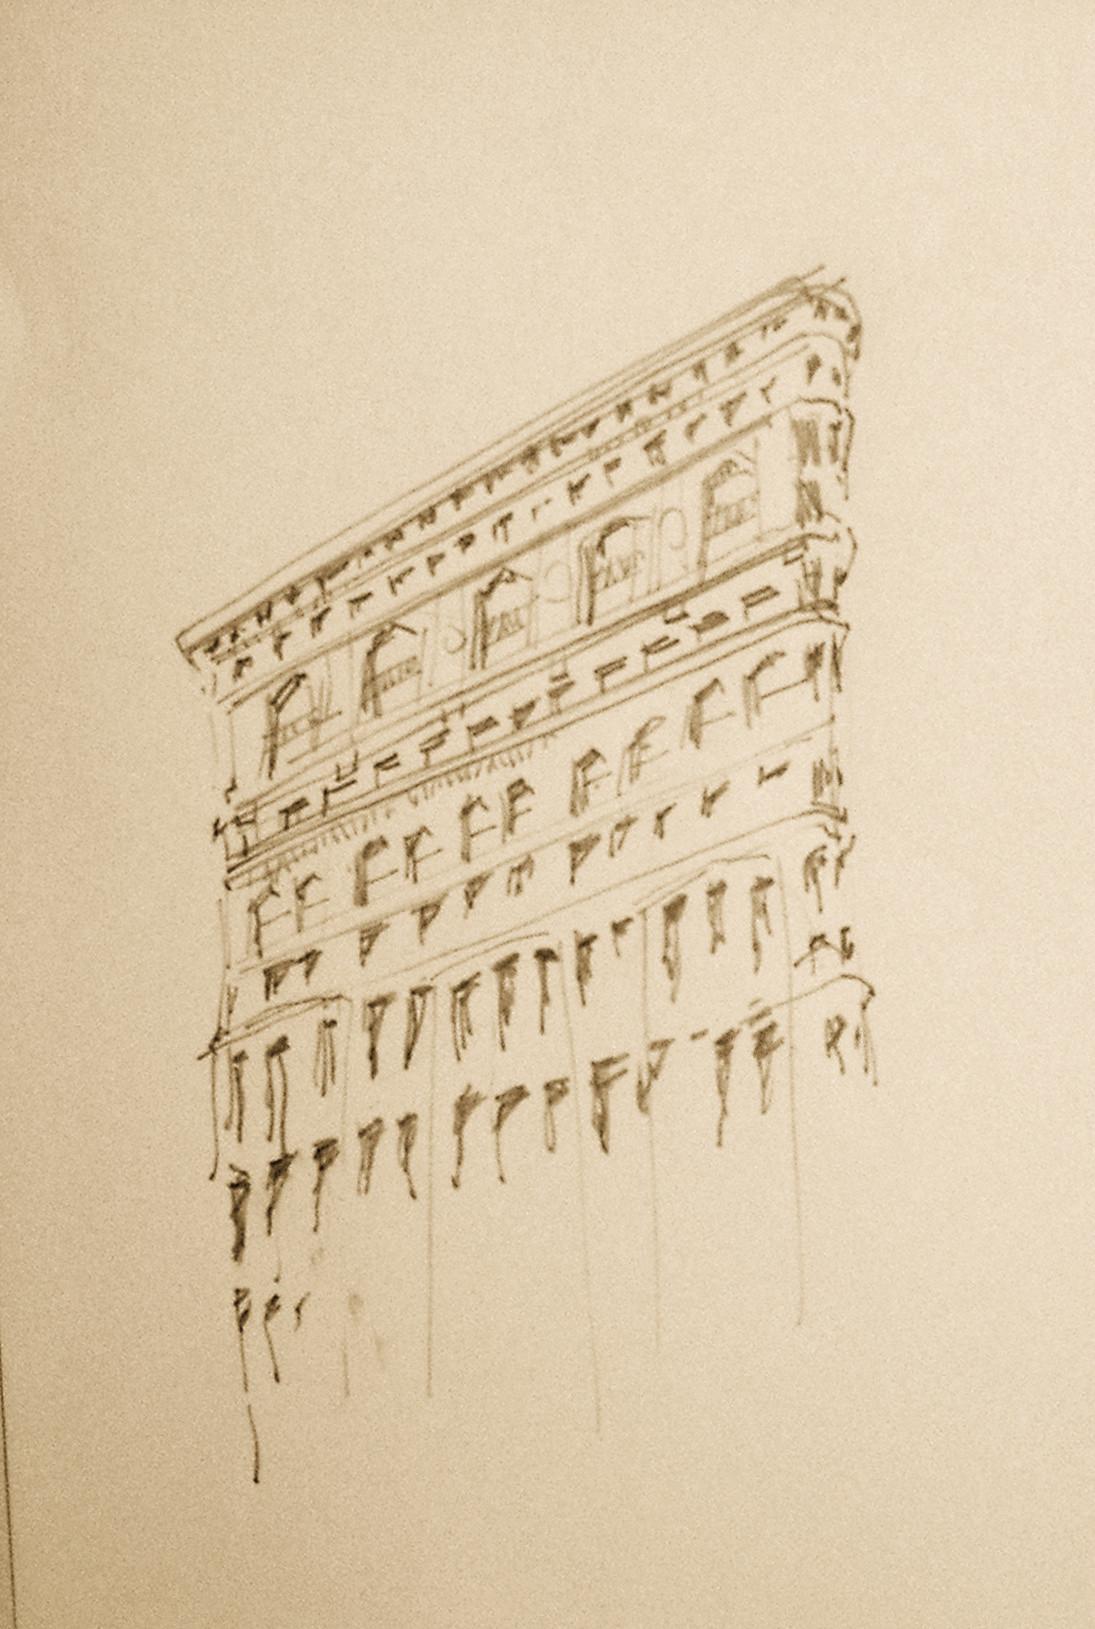 Flatiron building (NYC)